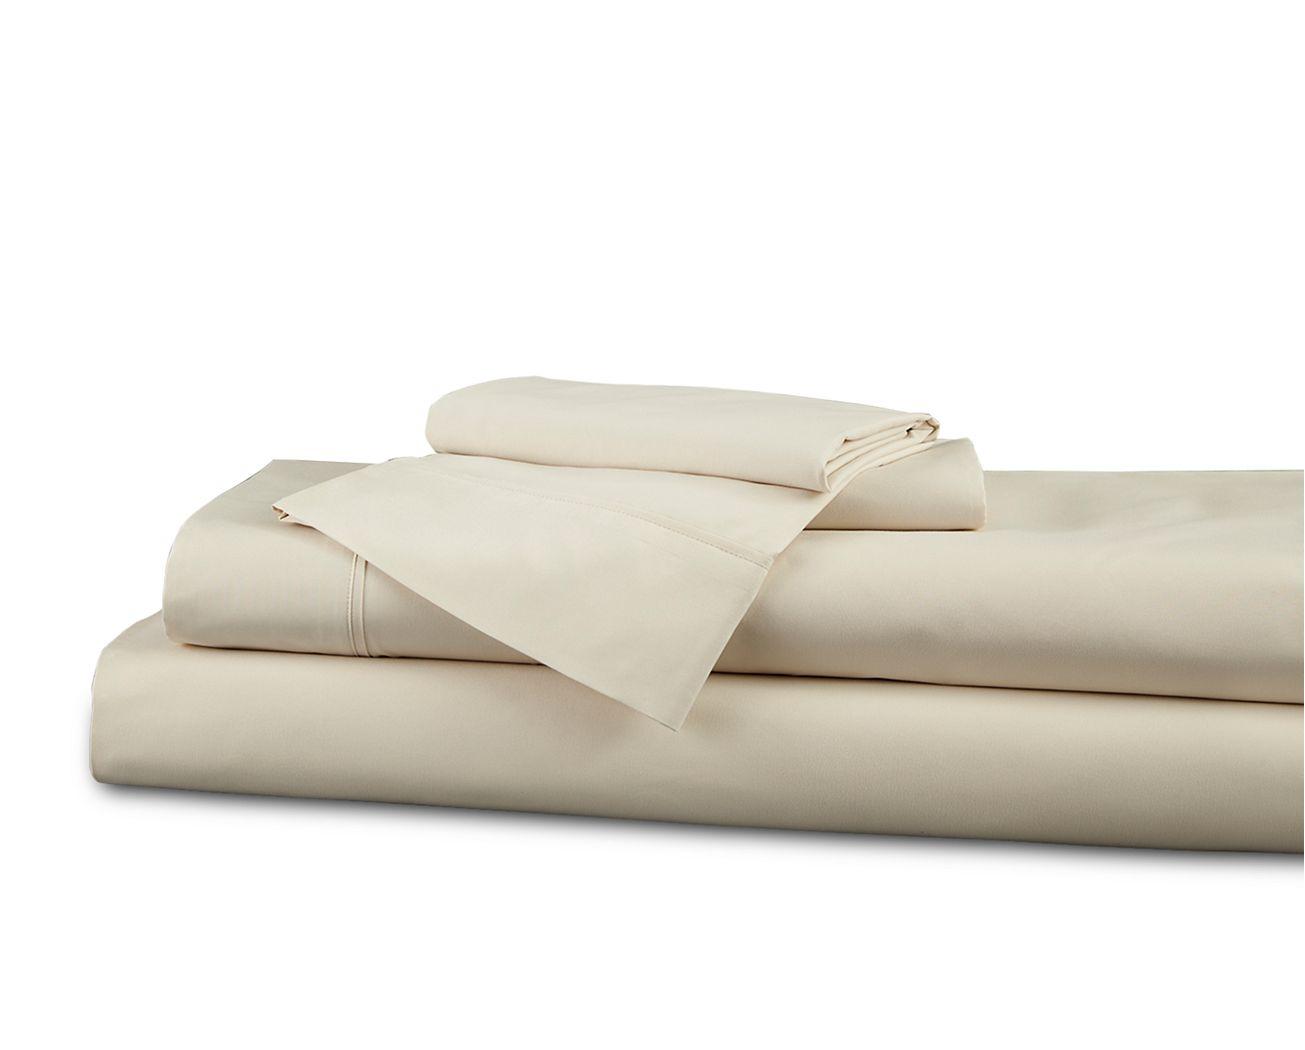 Dreamfit sheets